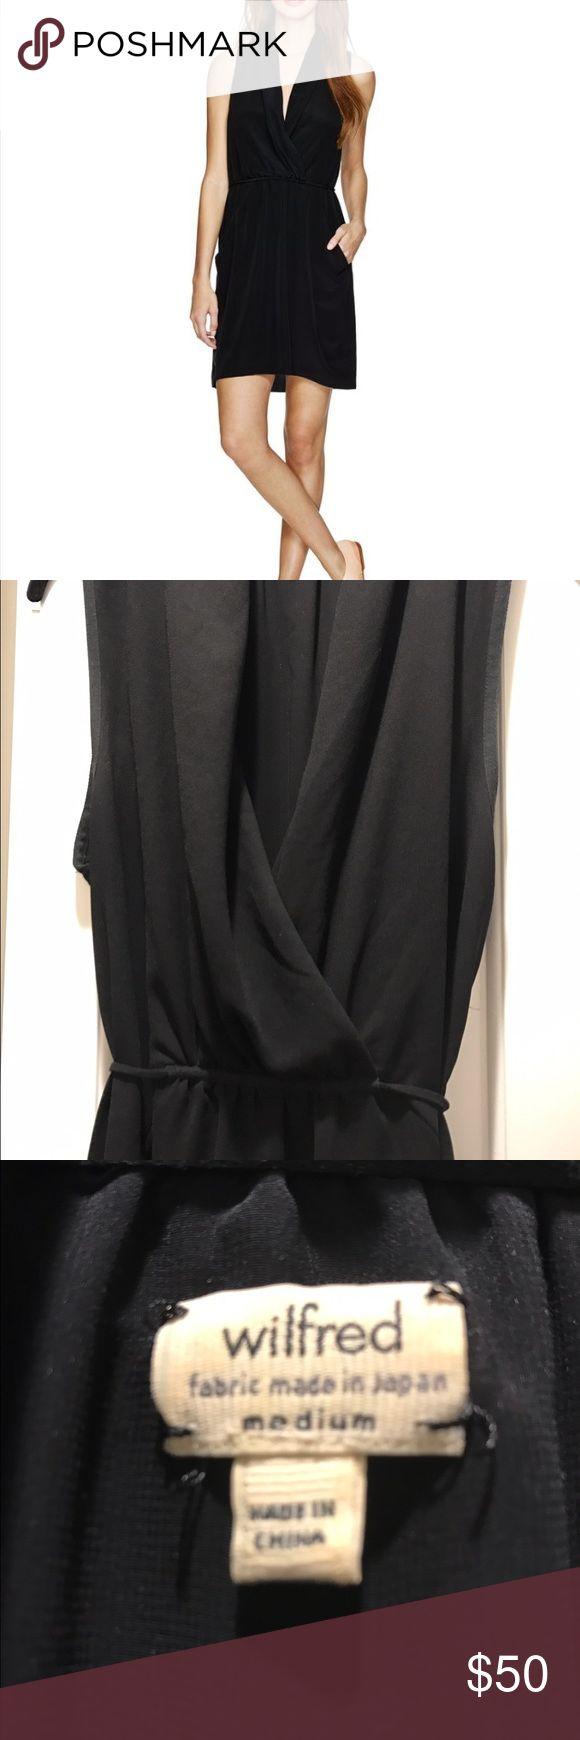 Aritzia little black dress Wilfred black dress- the perfect little black dress. Aritzia Dresses